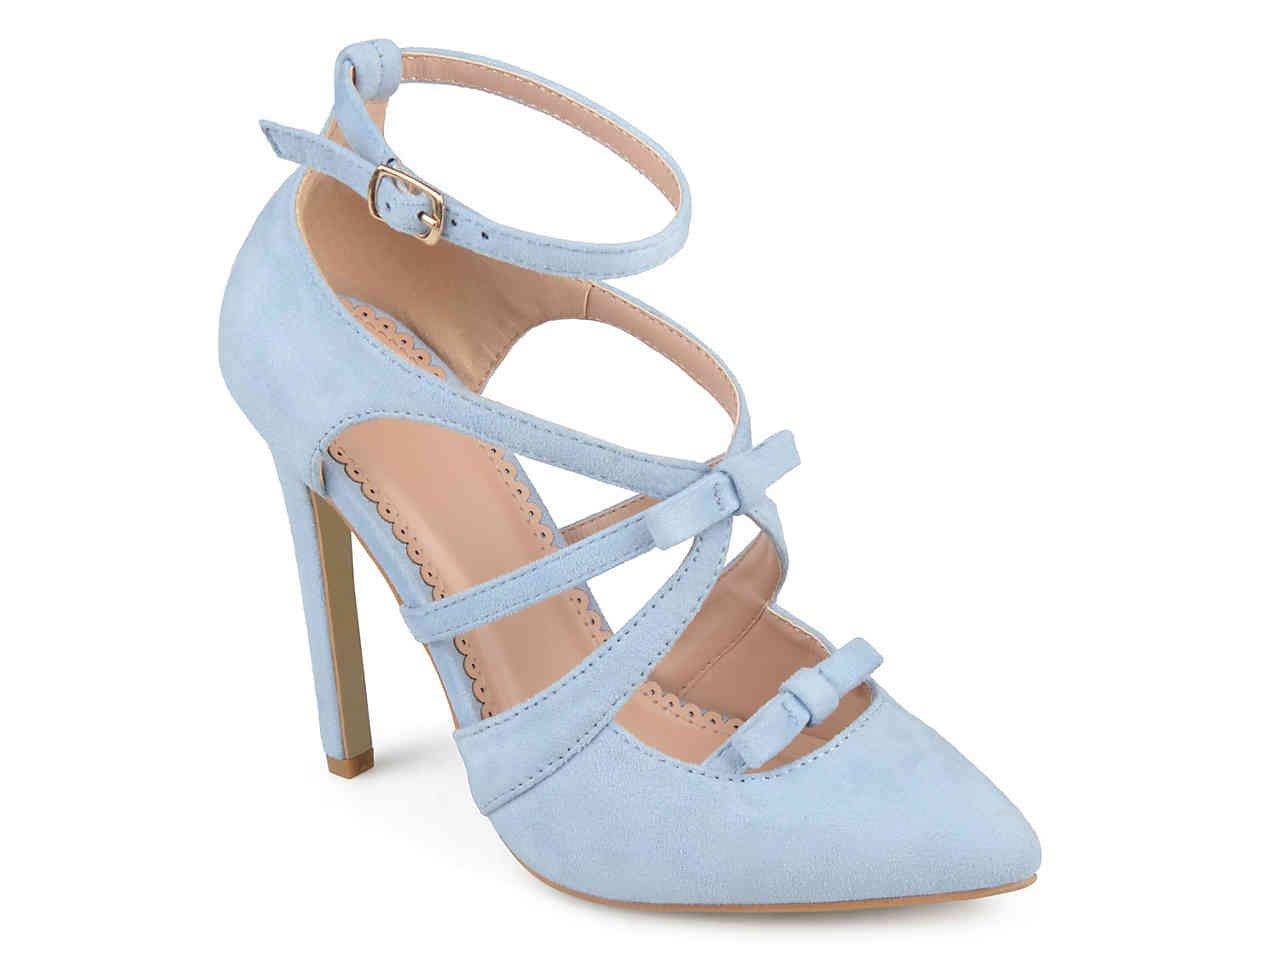 Journee Collection Darion Pump Women's Shoes   DSW